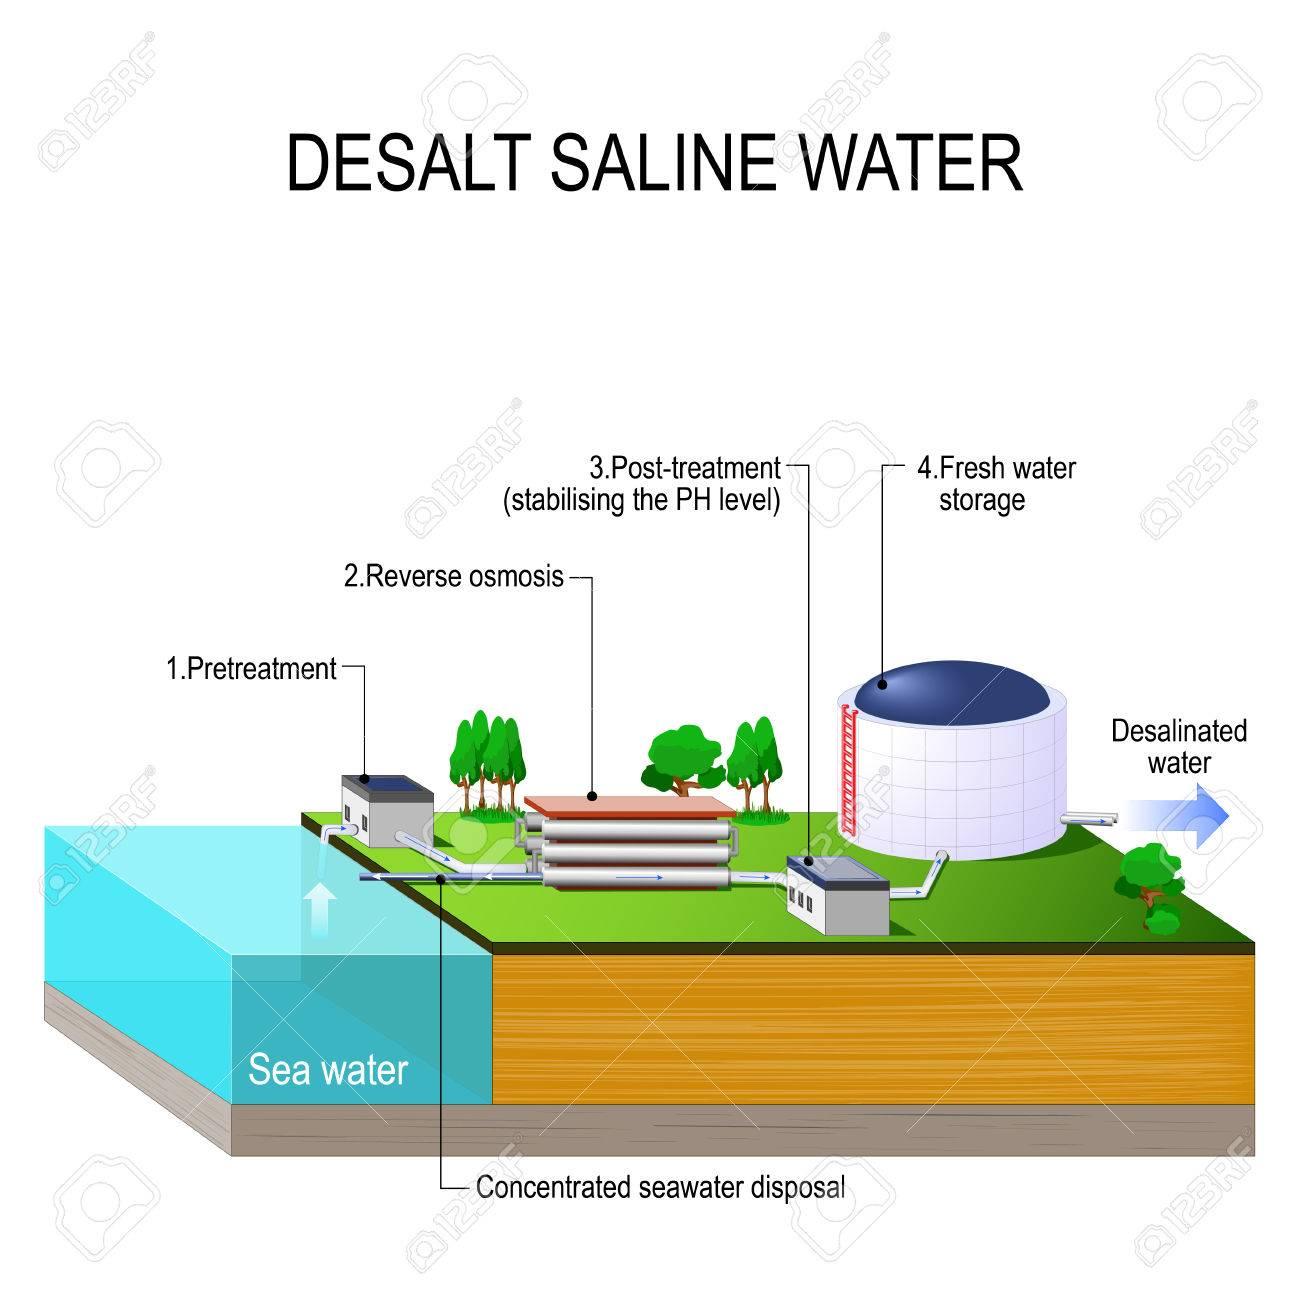 Desalination Plant Diagram Seawater Process Flow Ro Desalt Saline Water Vector Isometric Reverse Osmosis